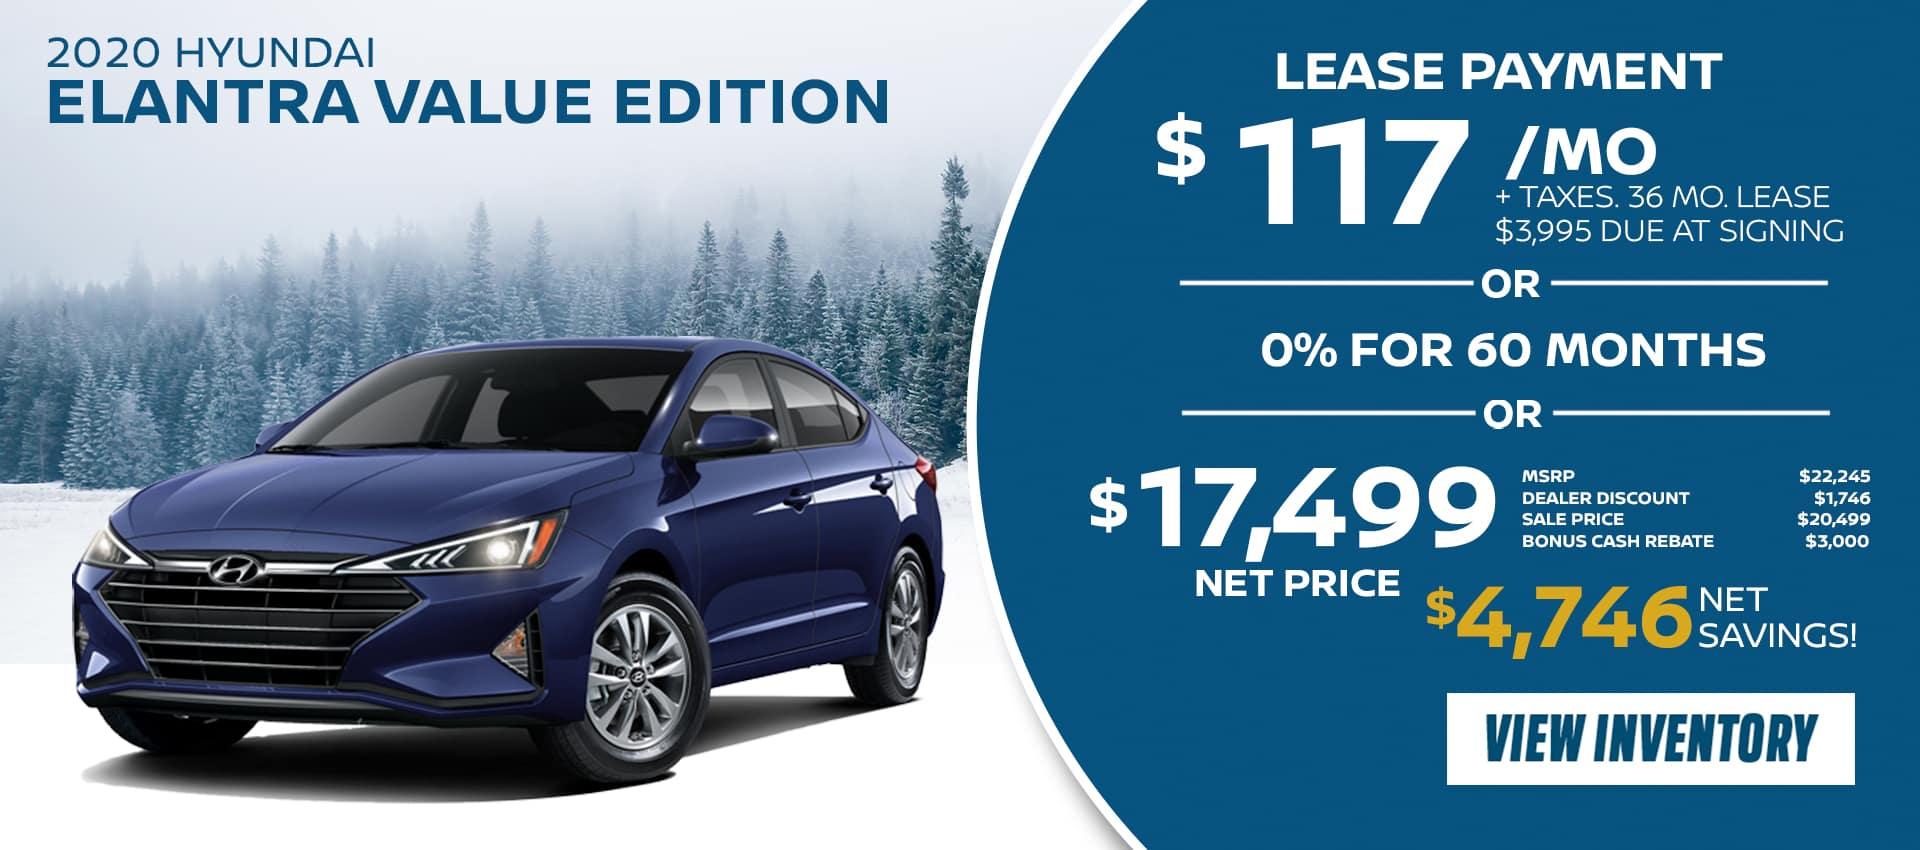 Hyundai Elantra Value